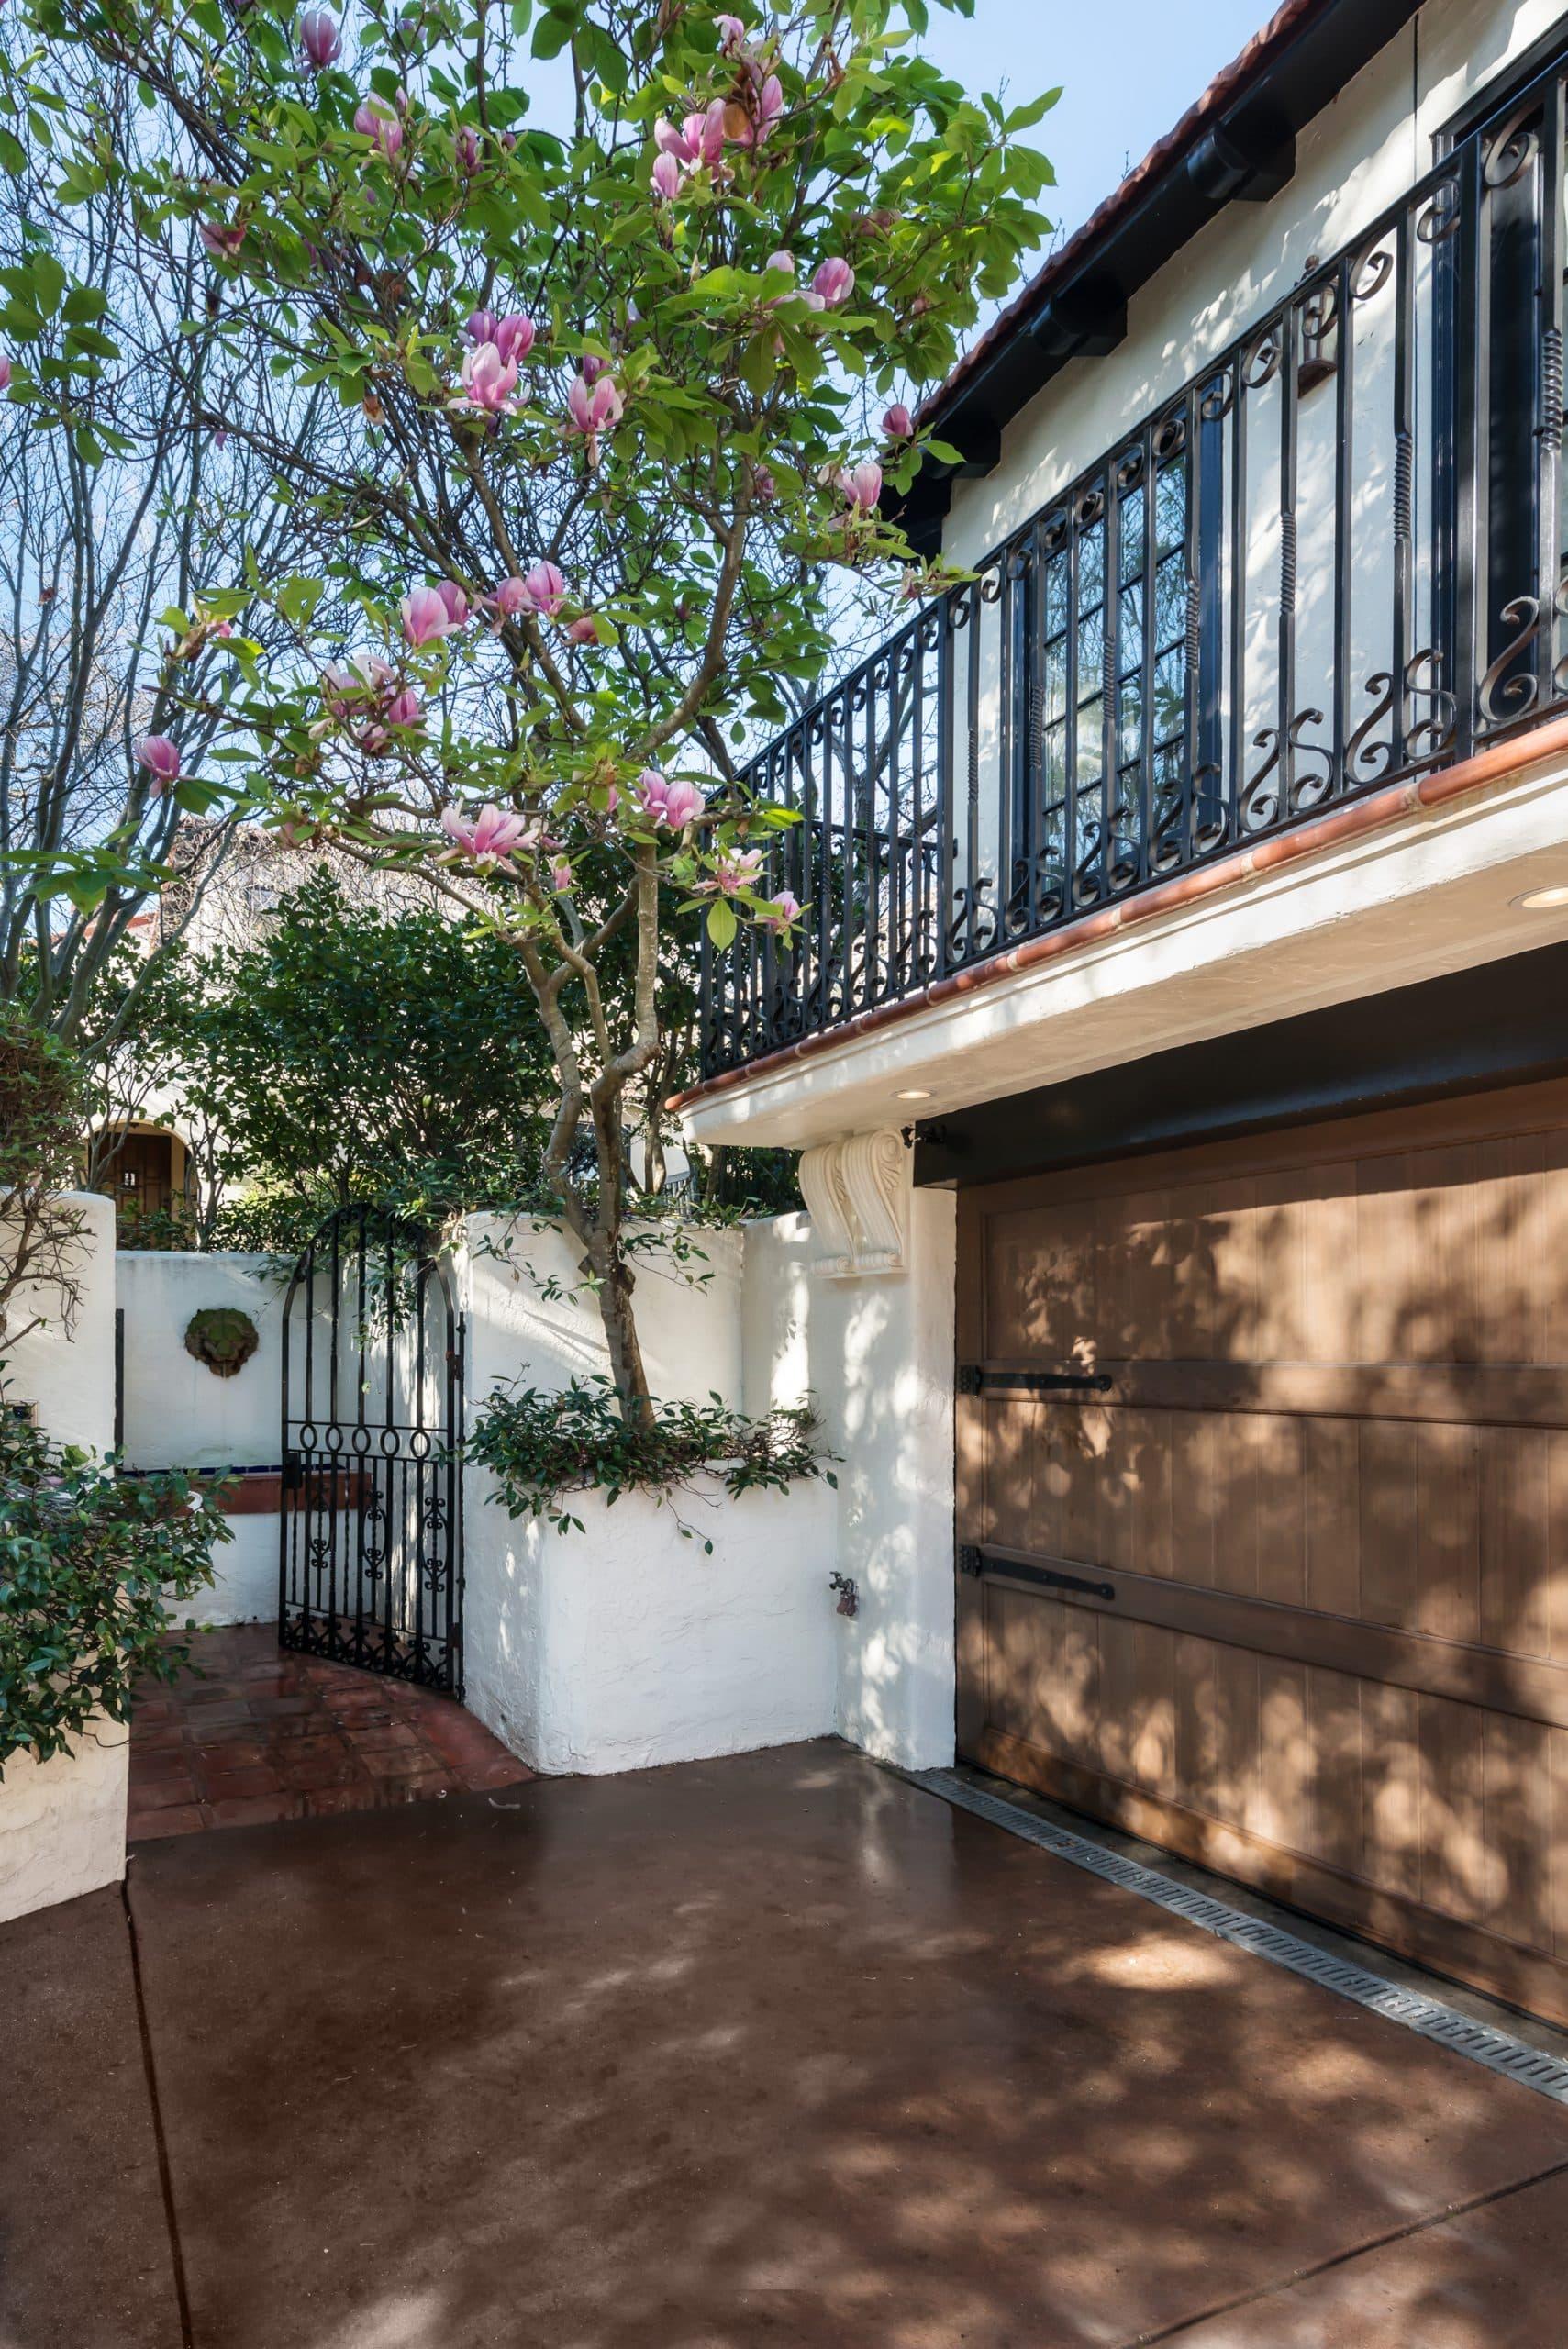 290 Scenic Avenue, Piedmont, CA Carriage House Photo 4